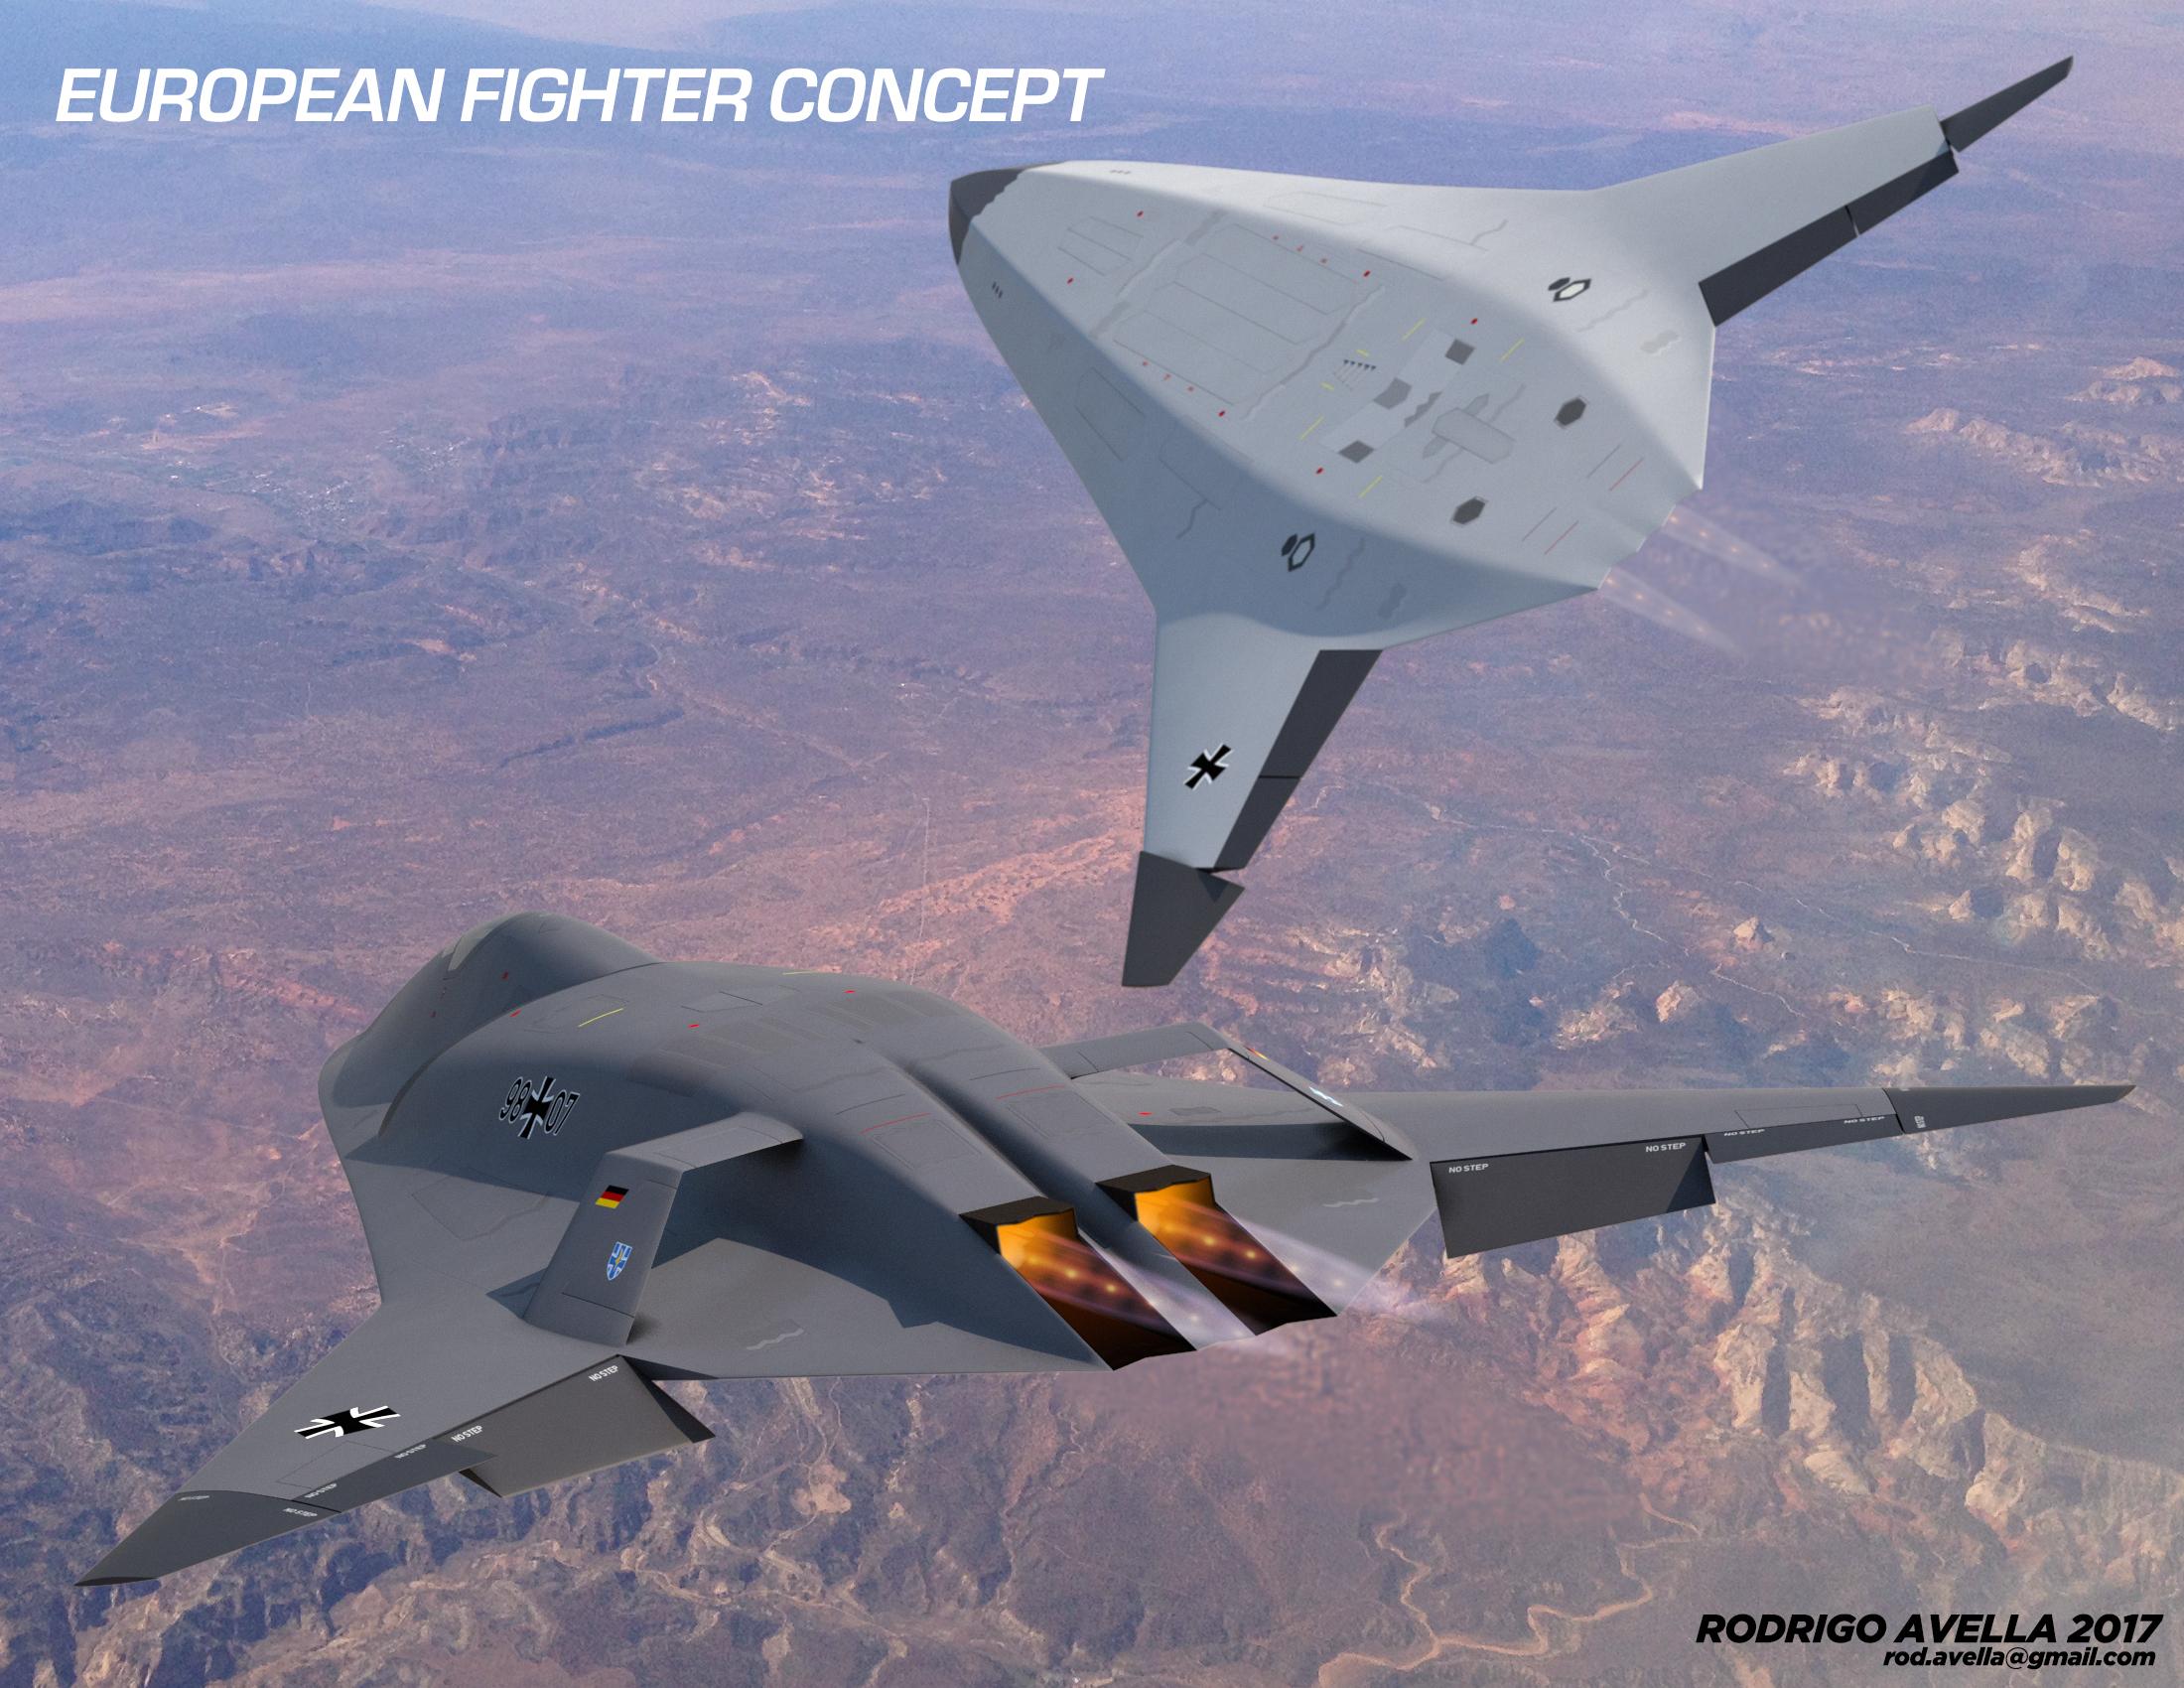 Drawn jet military Dominance next European Concept generation